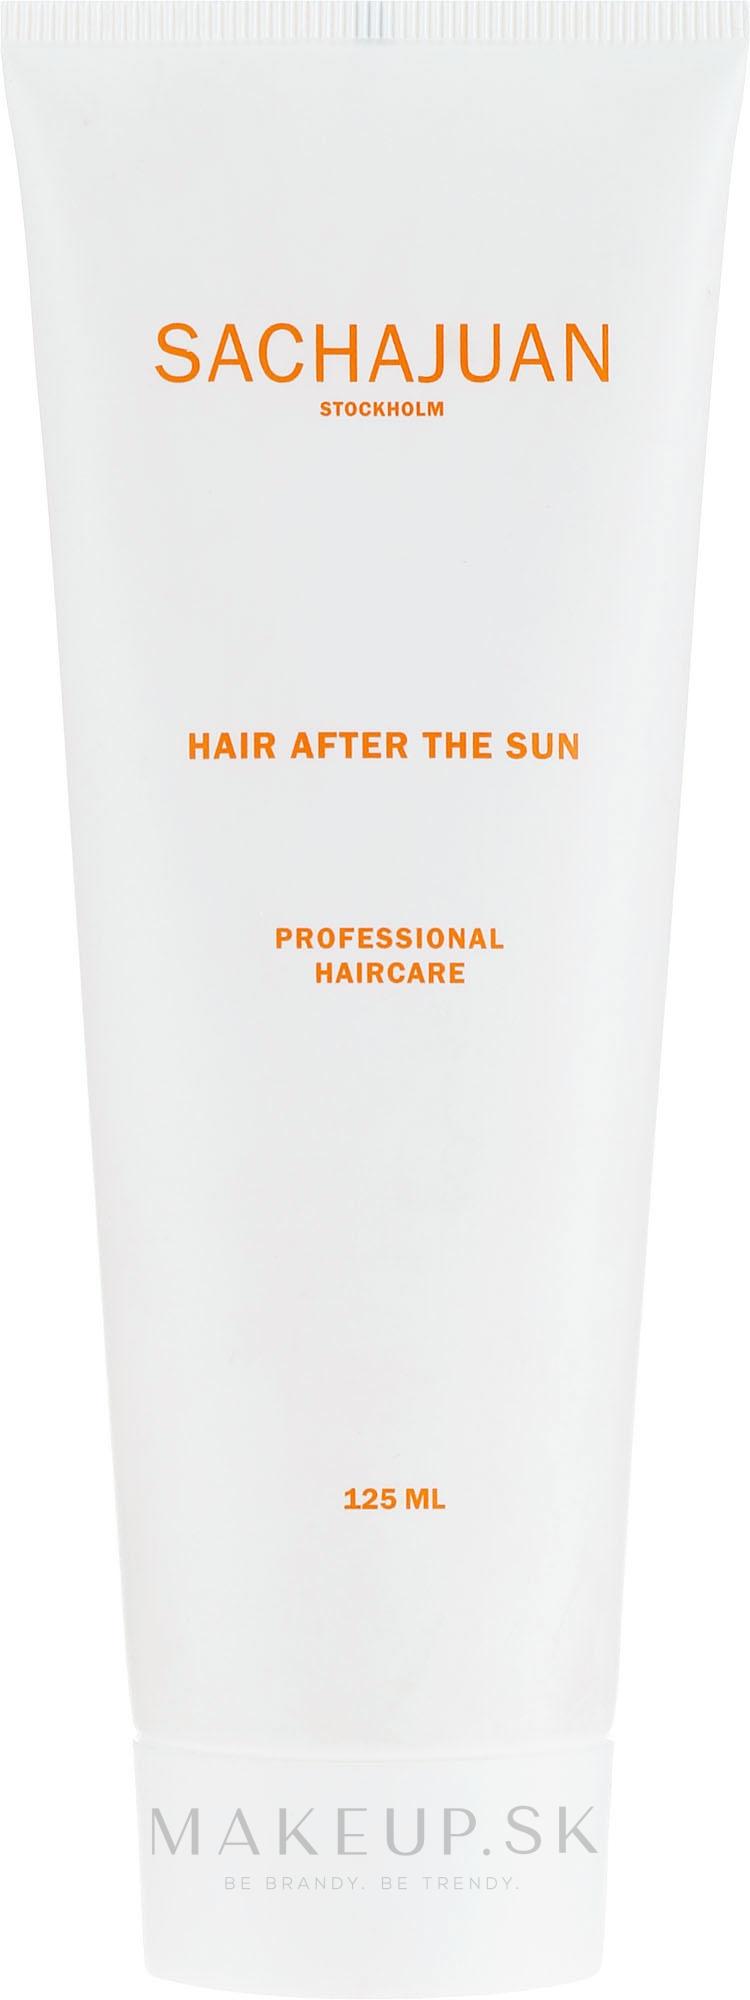 Prostriedok na vlasy po slnku - Sachajuan Sachajuan Hair After The Sun — Obrázky 125 ml